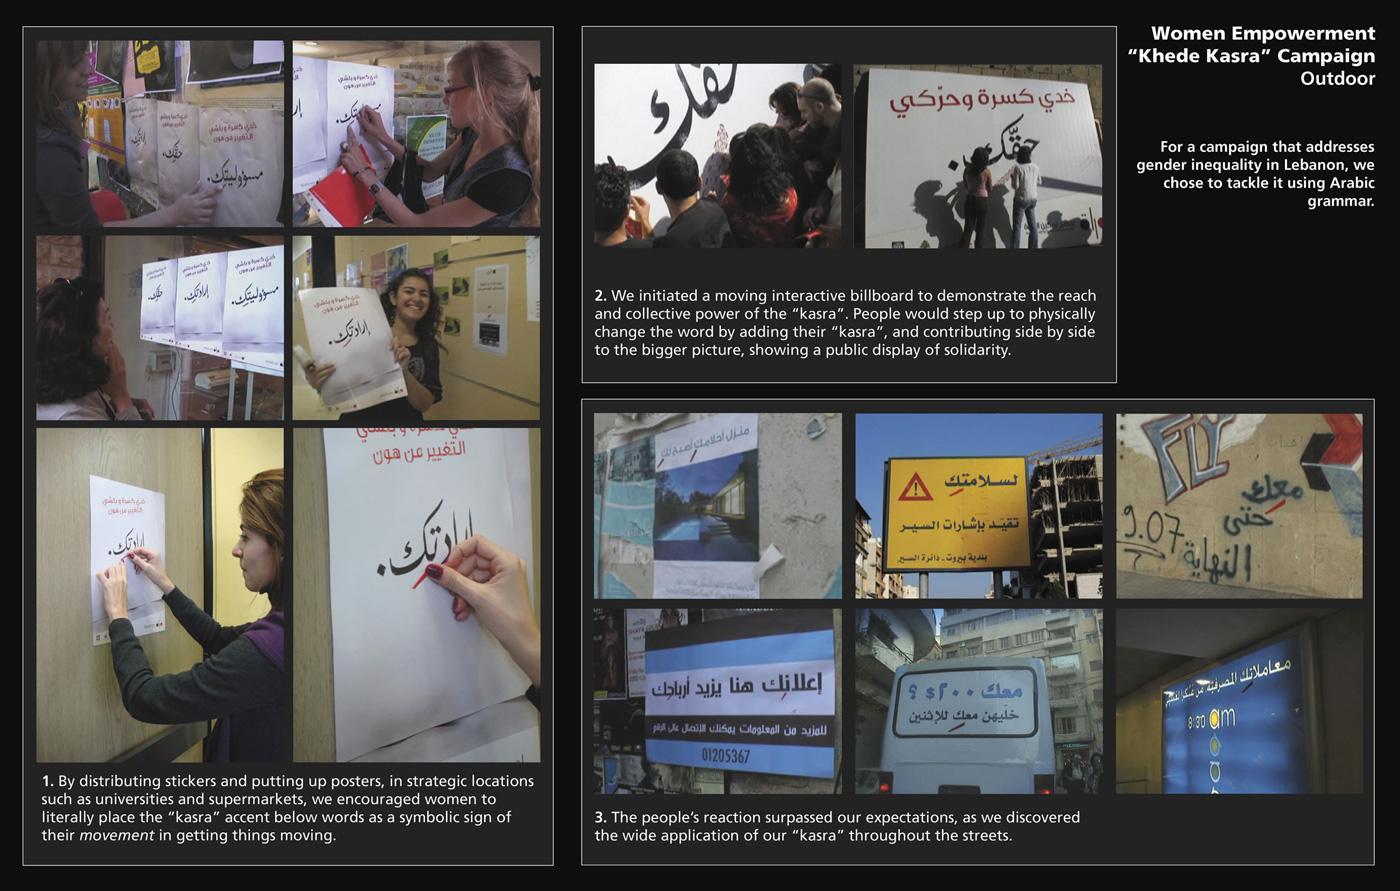 Women Empowerment Ambient Ad -  Khede Kasra